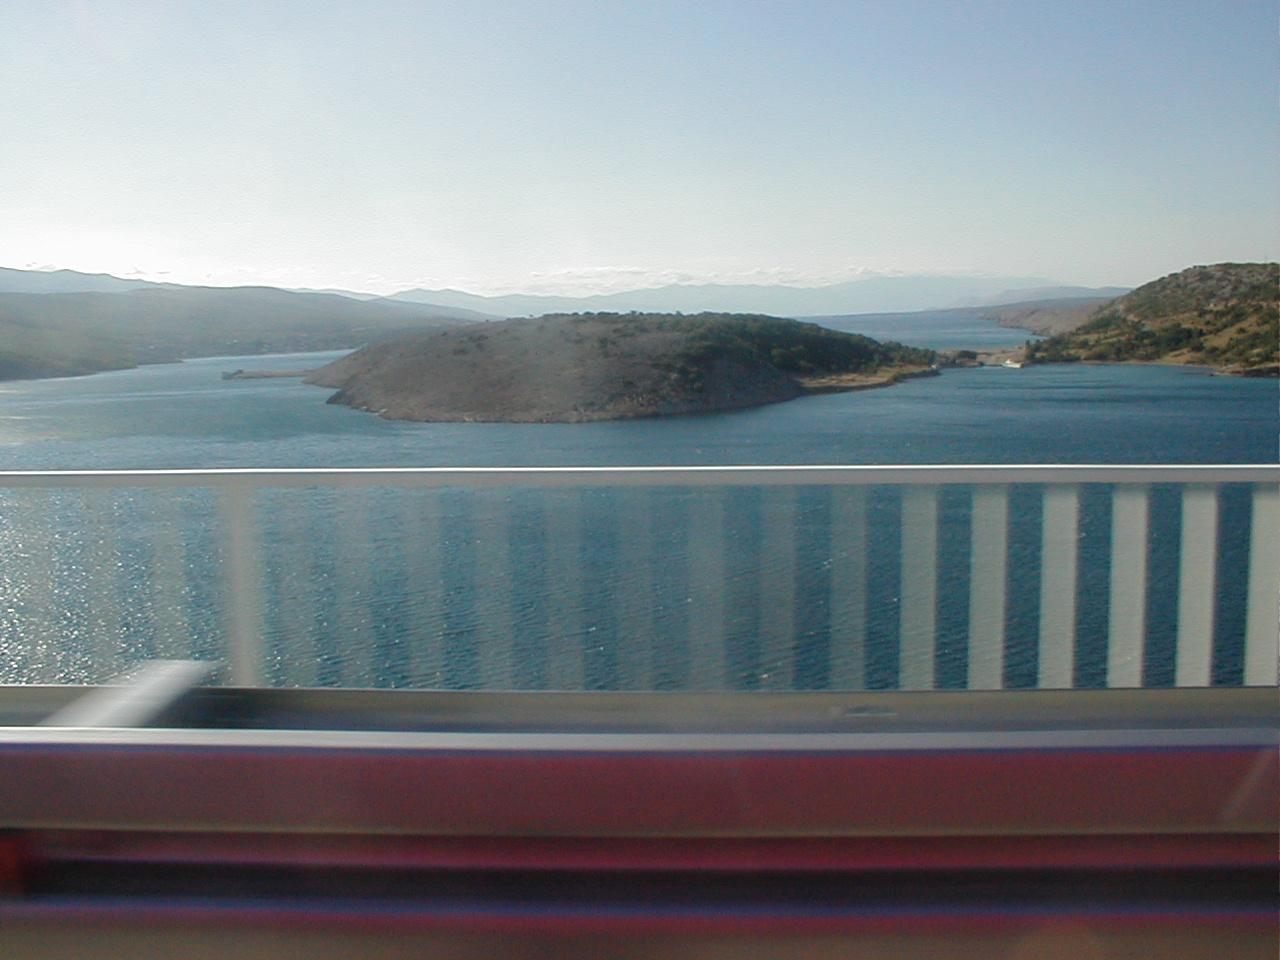 speeding train bridge island bay speed rails